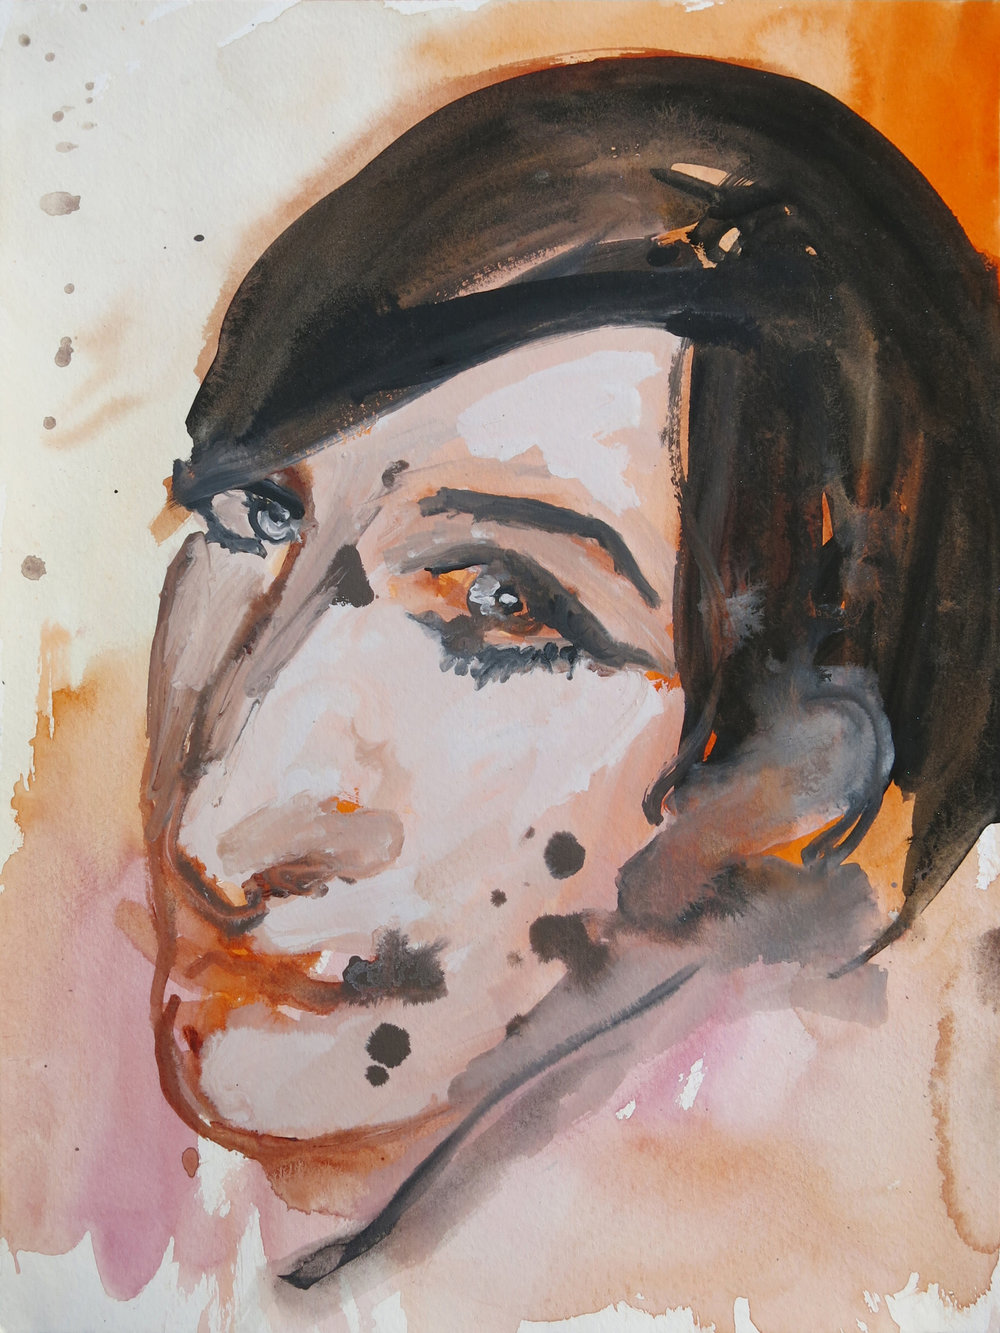 Barbra Streisand Portrait #178